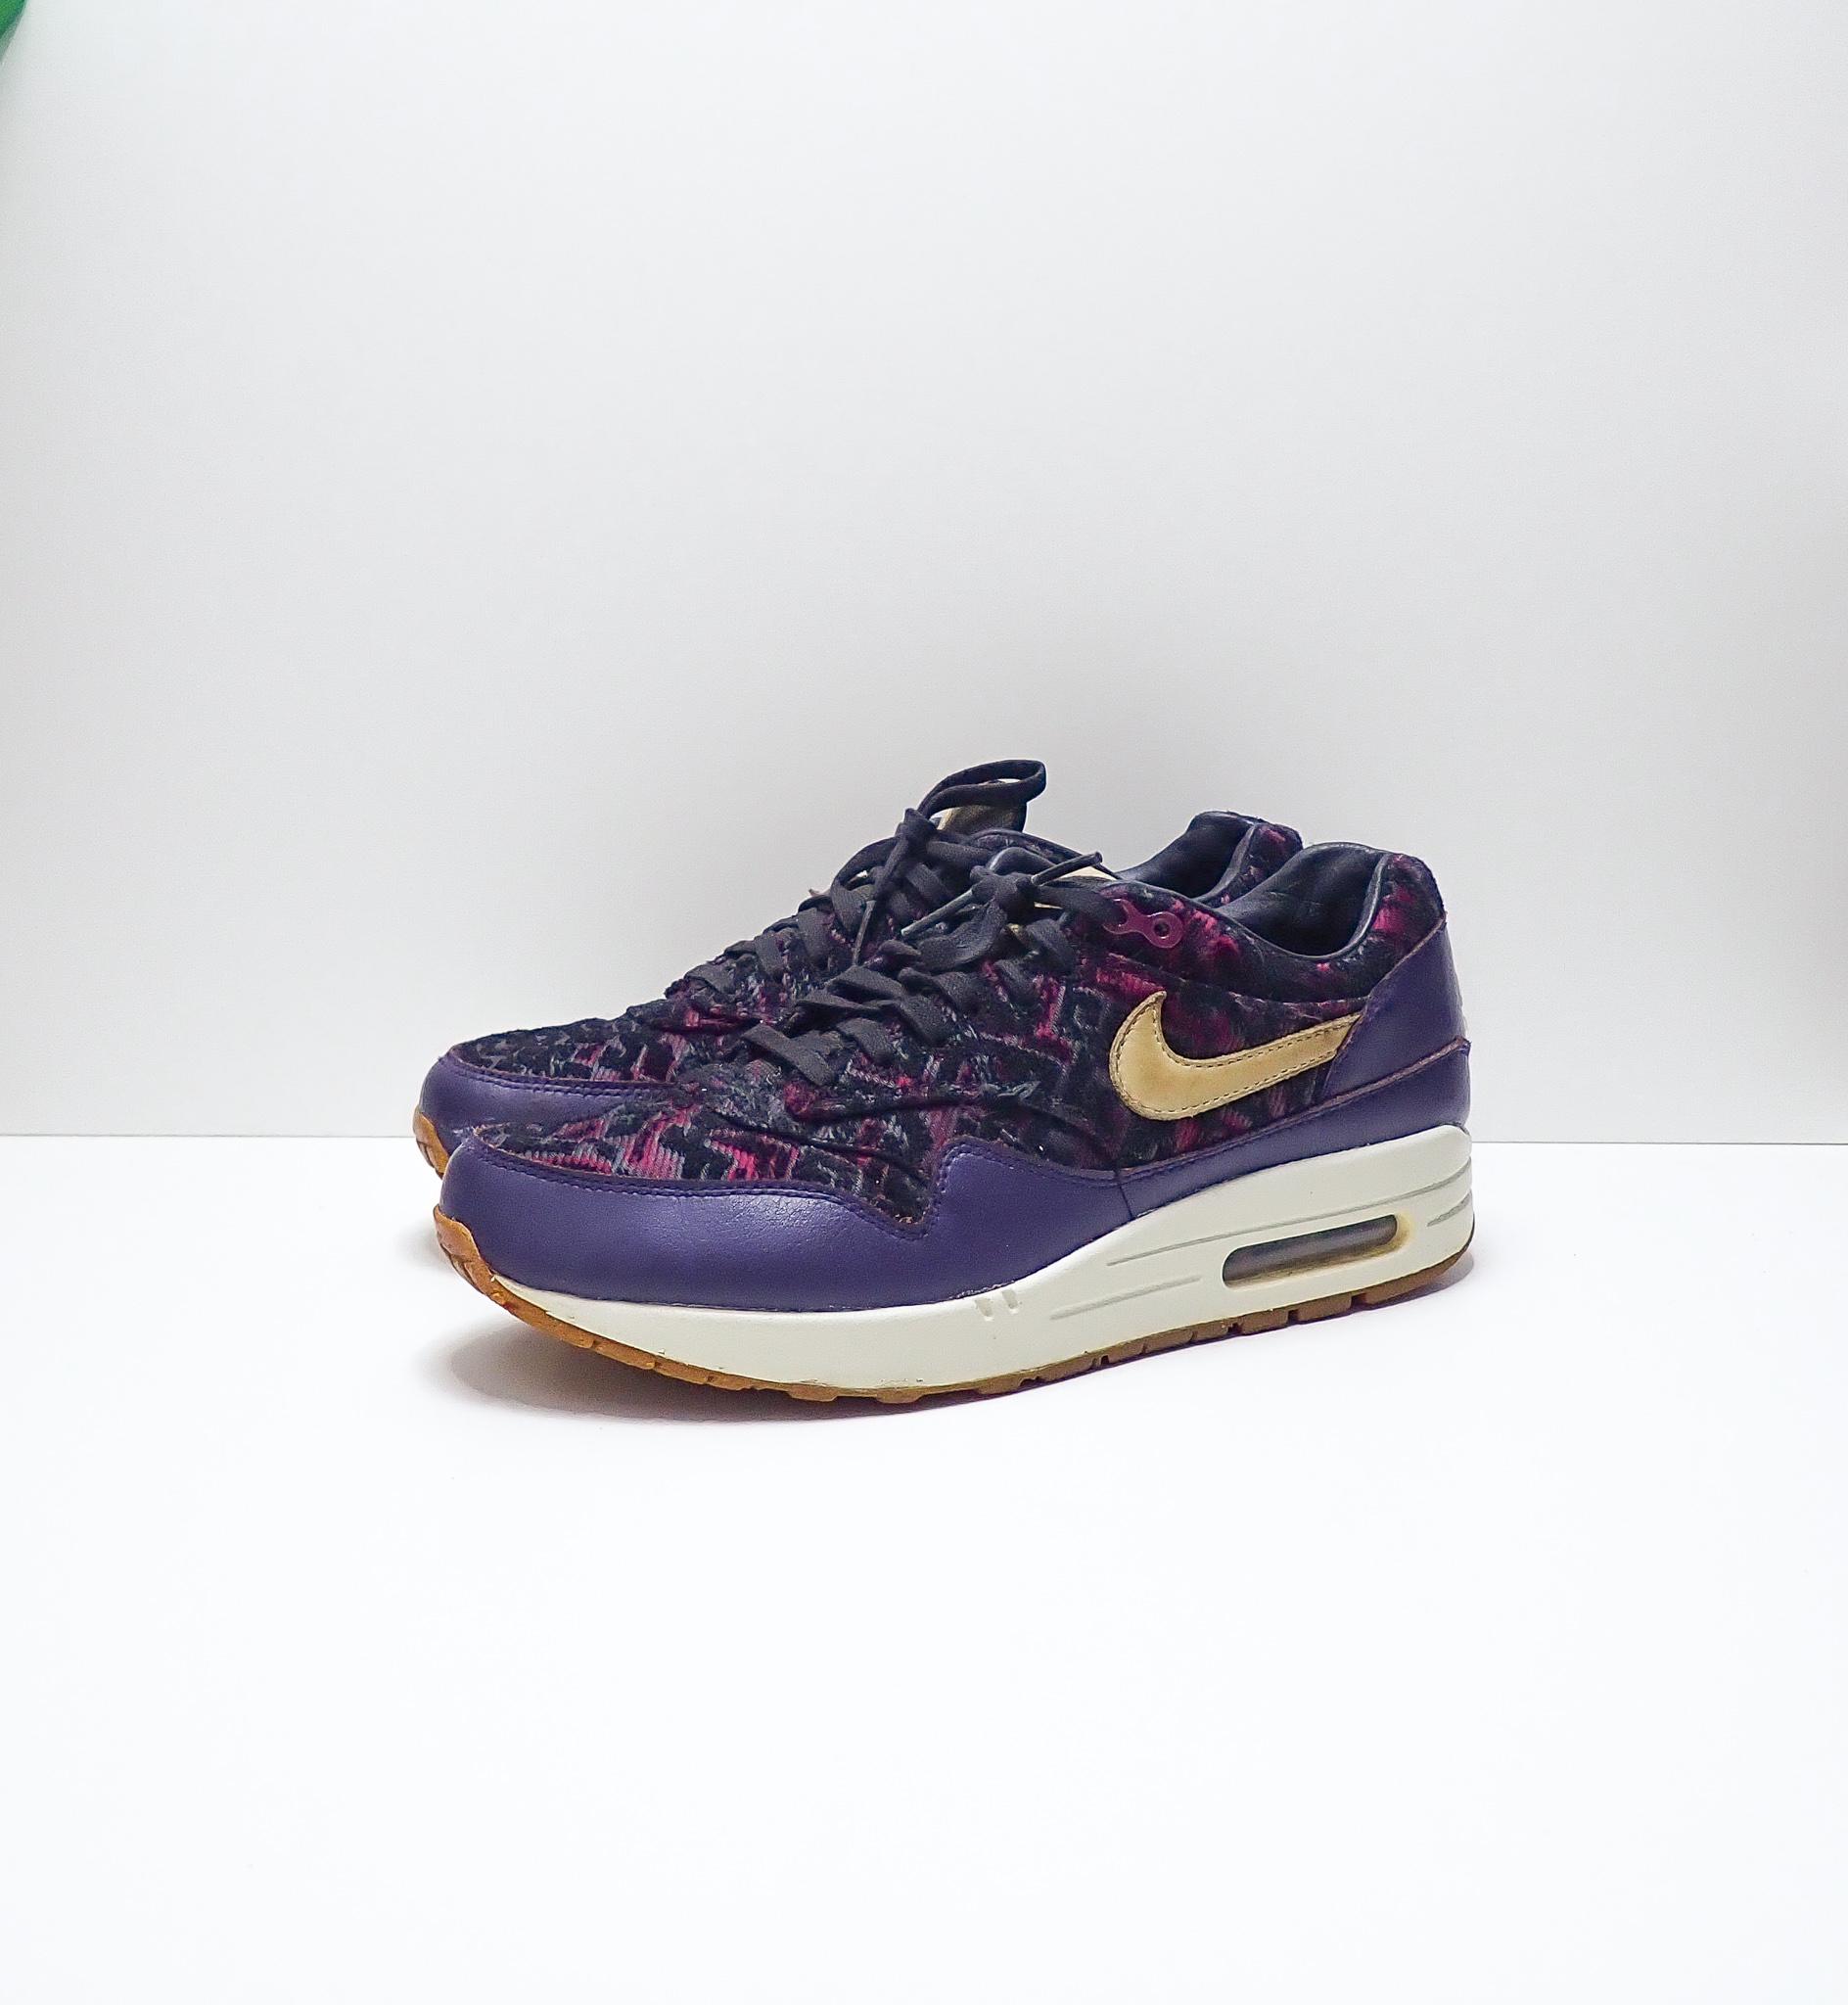 Nike Air Max 1 Purple Dynasty